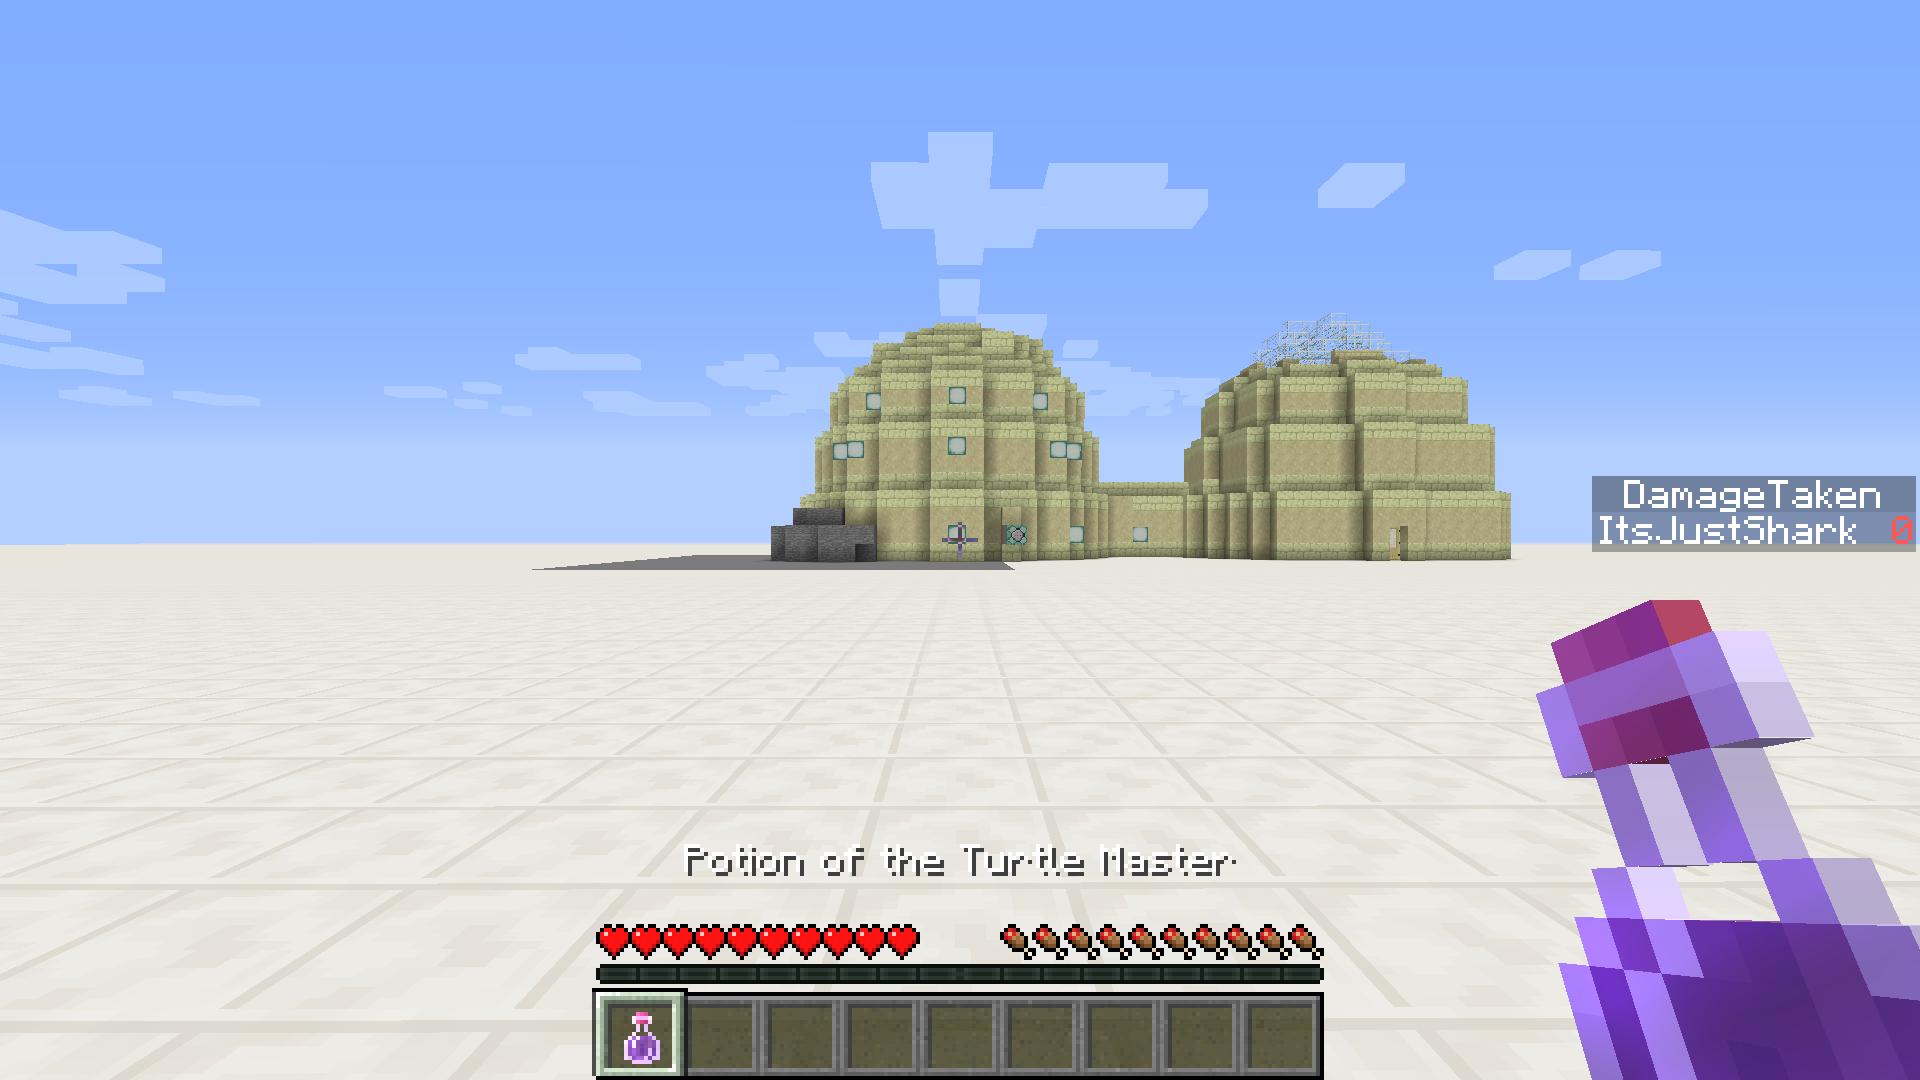 MC-126710] Turtle master potion is too op - Jira